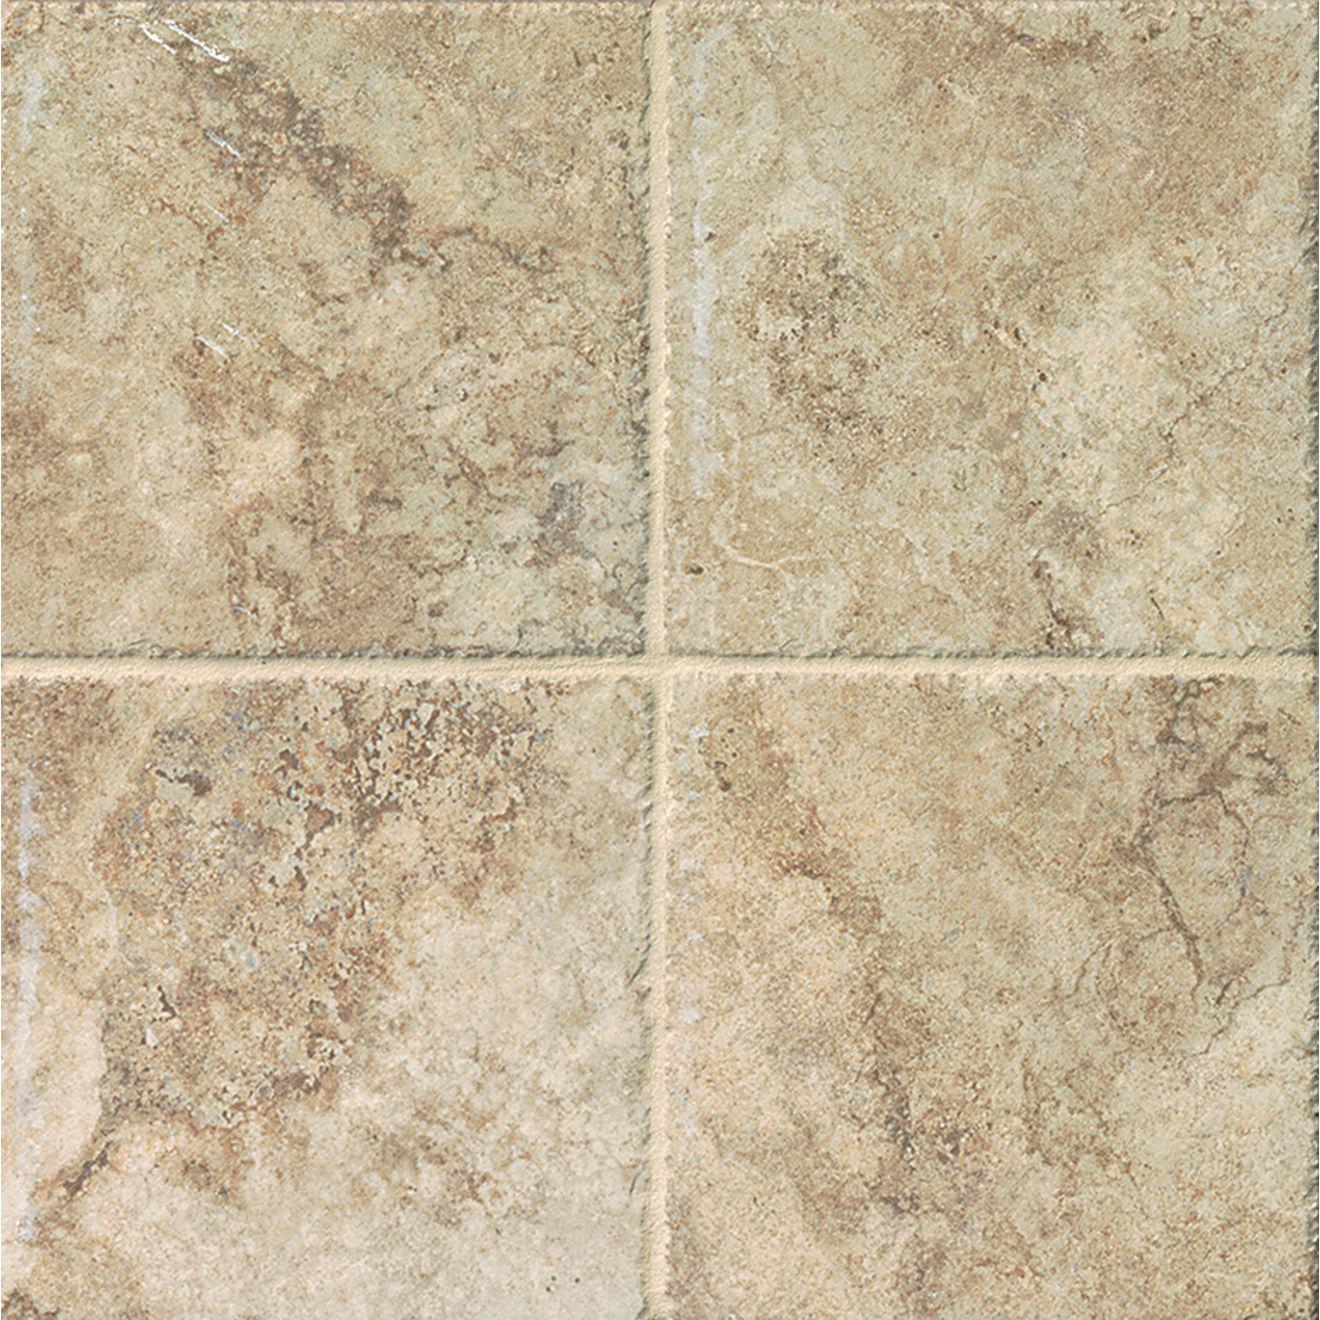 "Forge 6.5"" x 6.5"" Floor & Wall Tile in Beige"